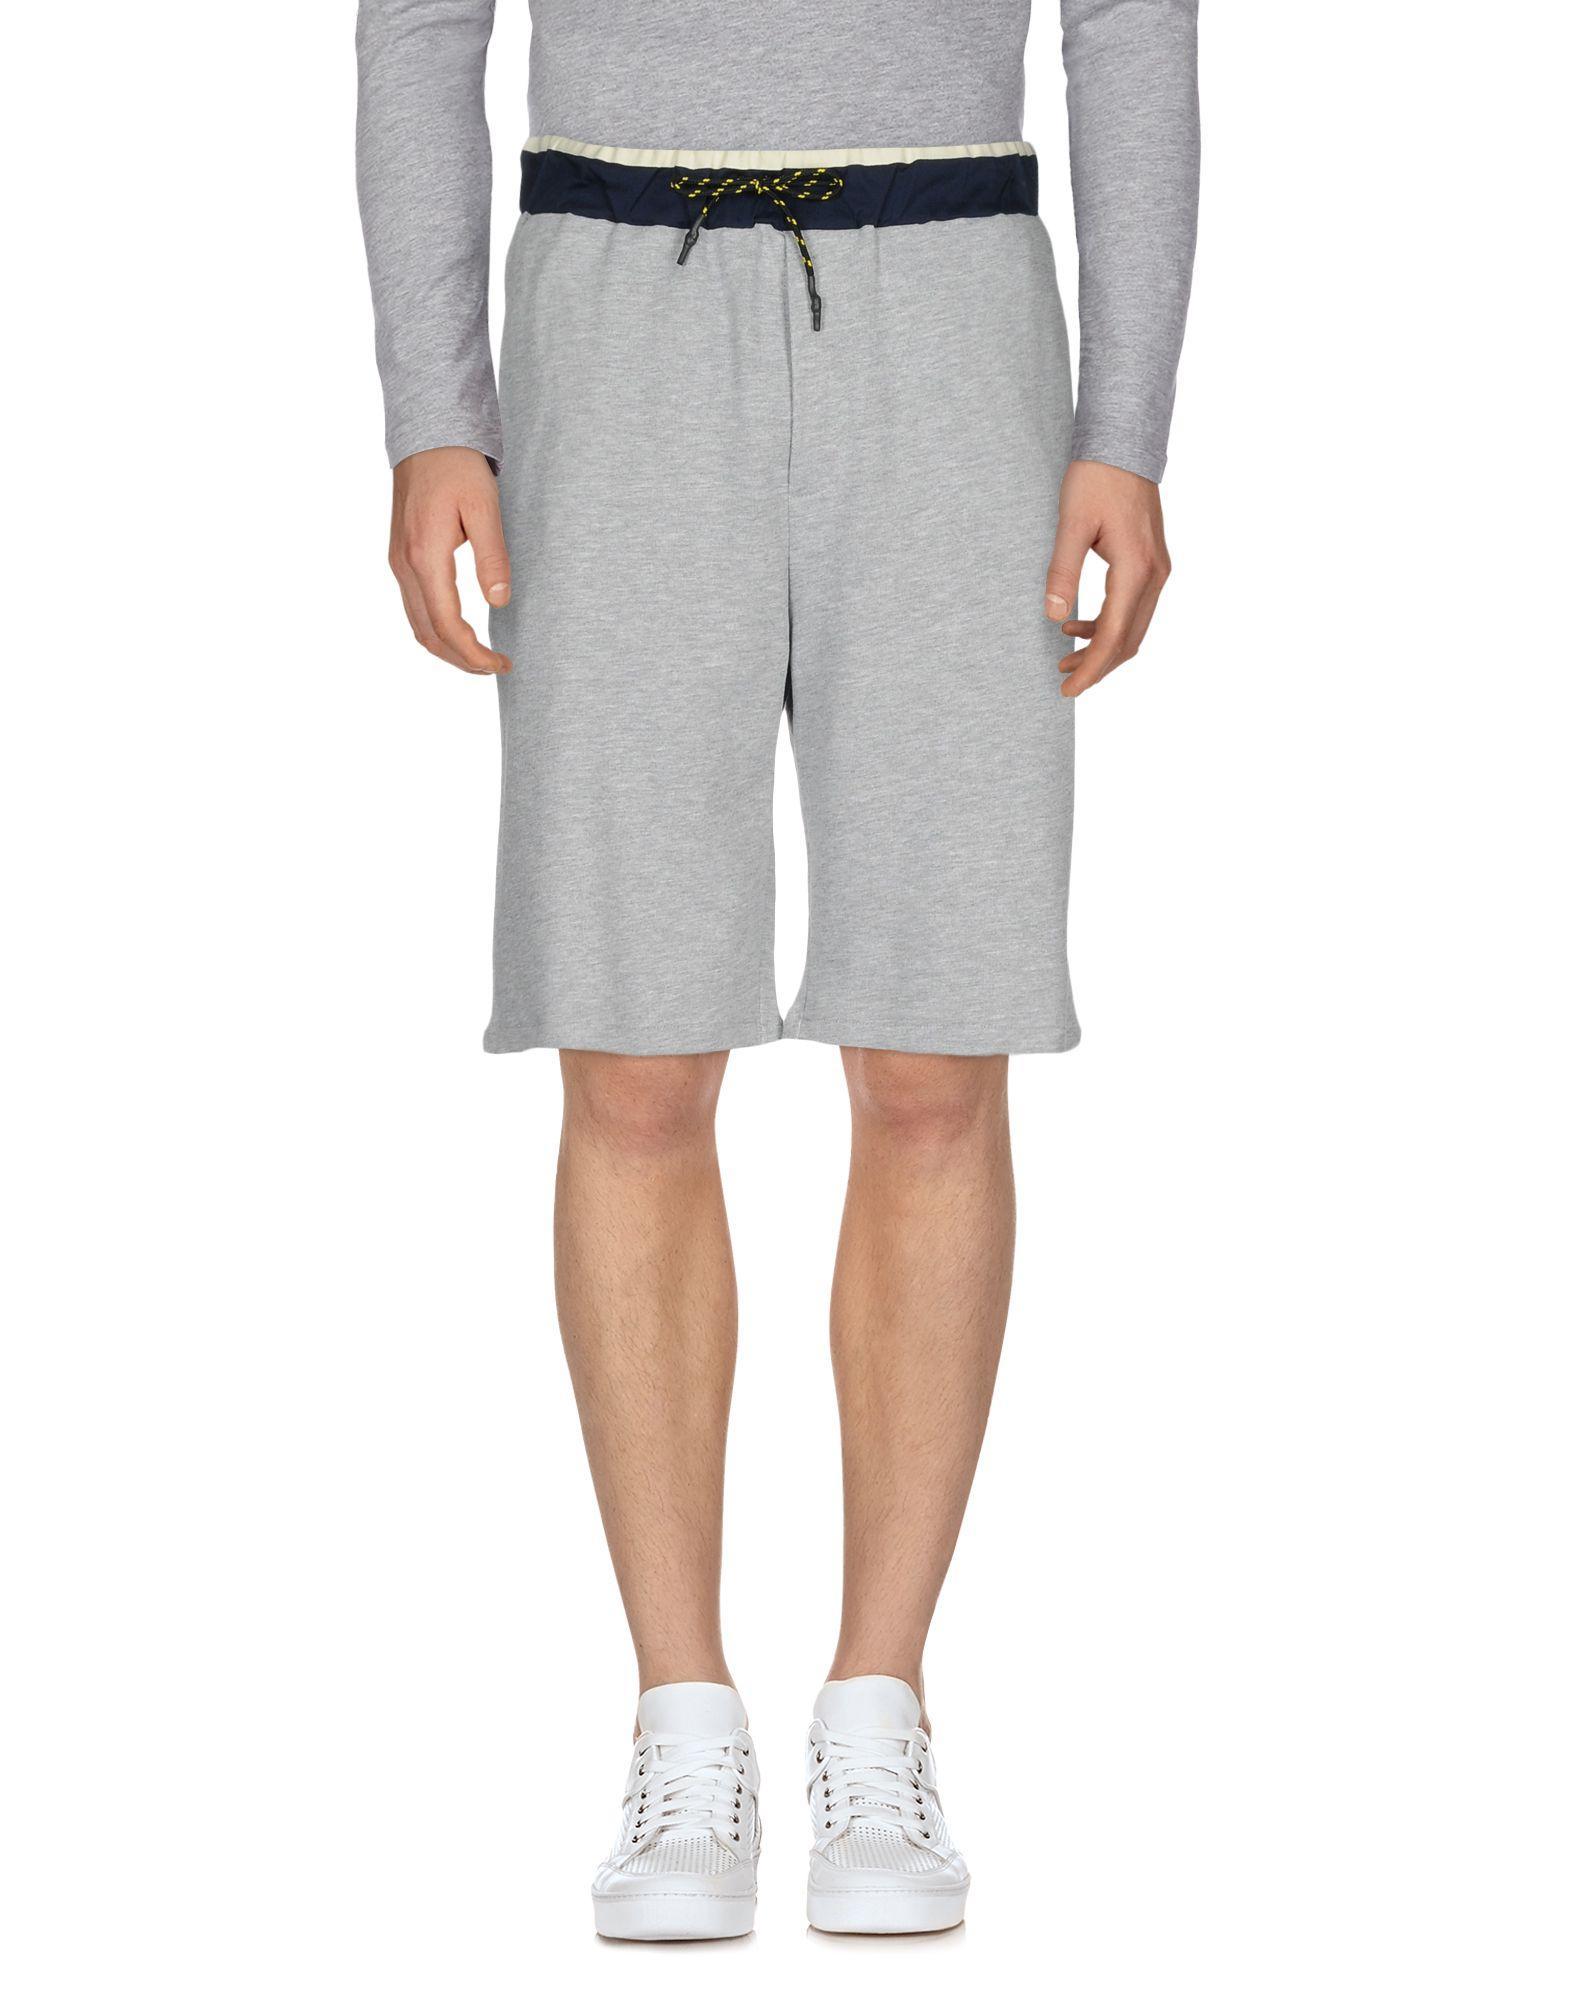 Low Brand Shorts & Bermuda In Grey